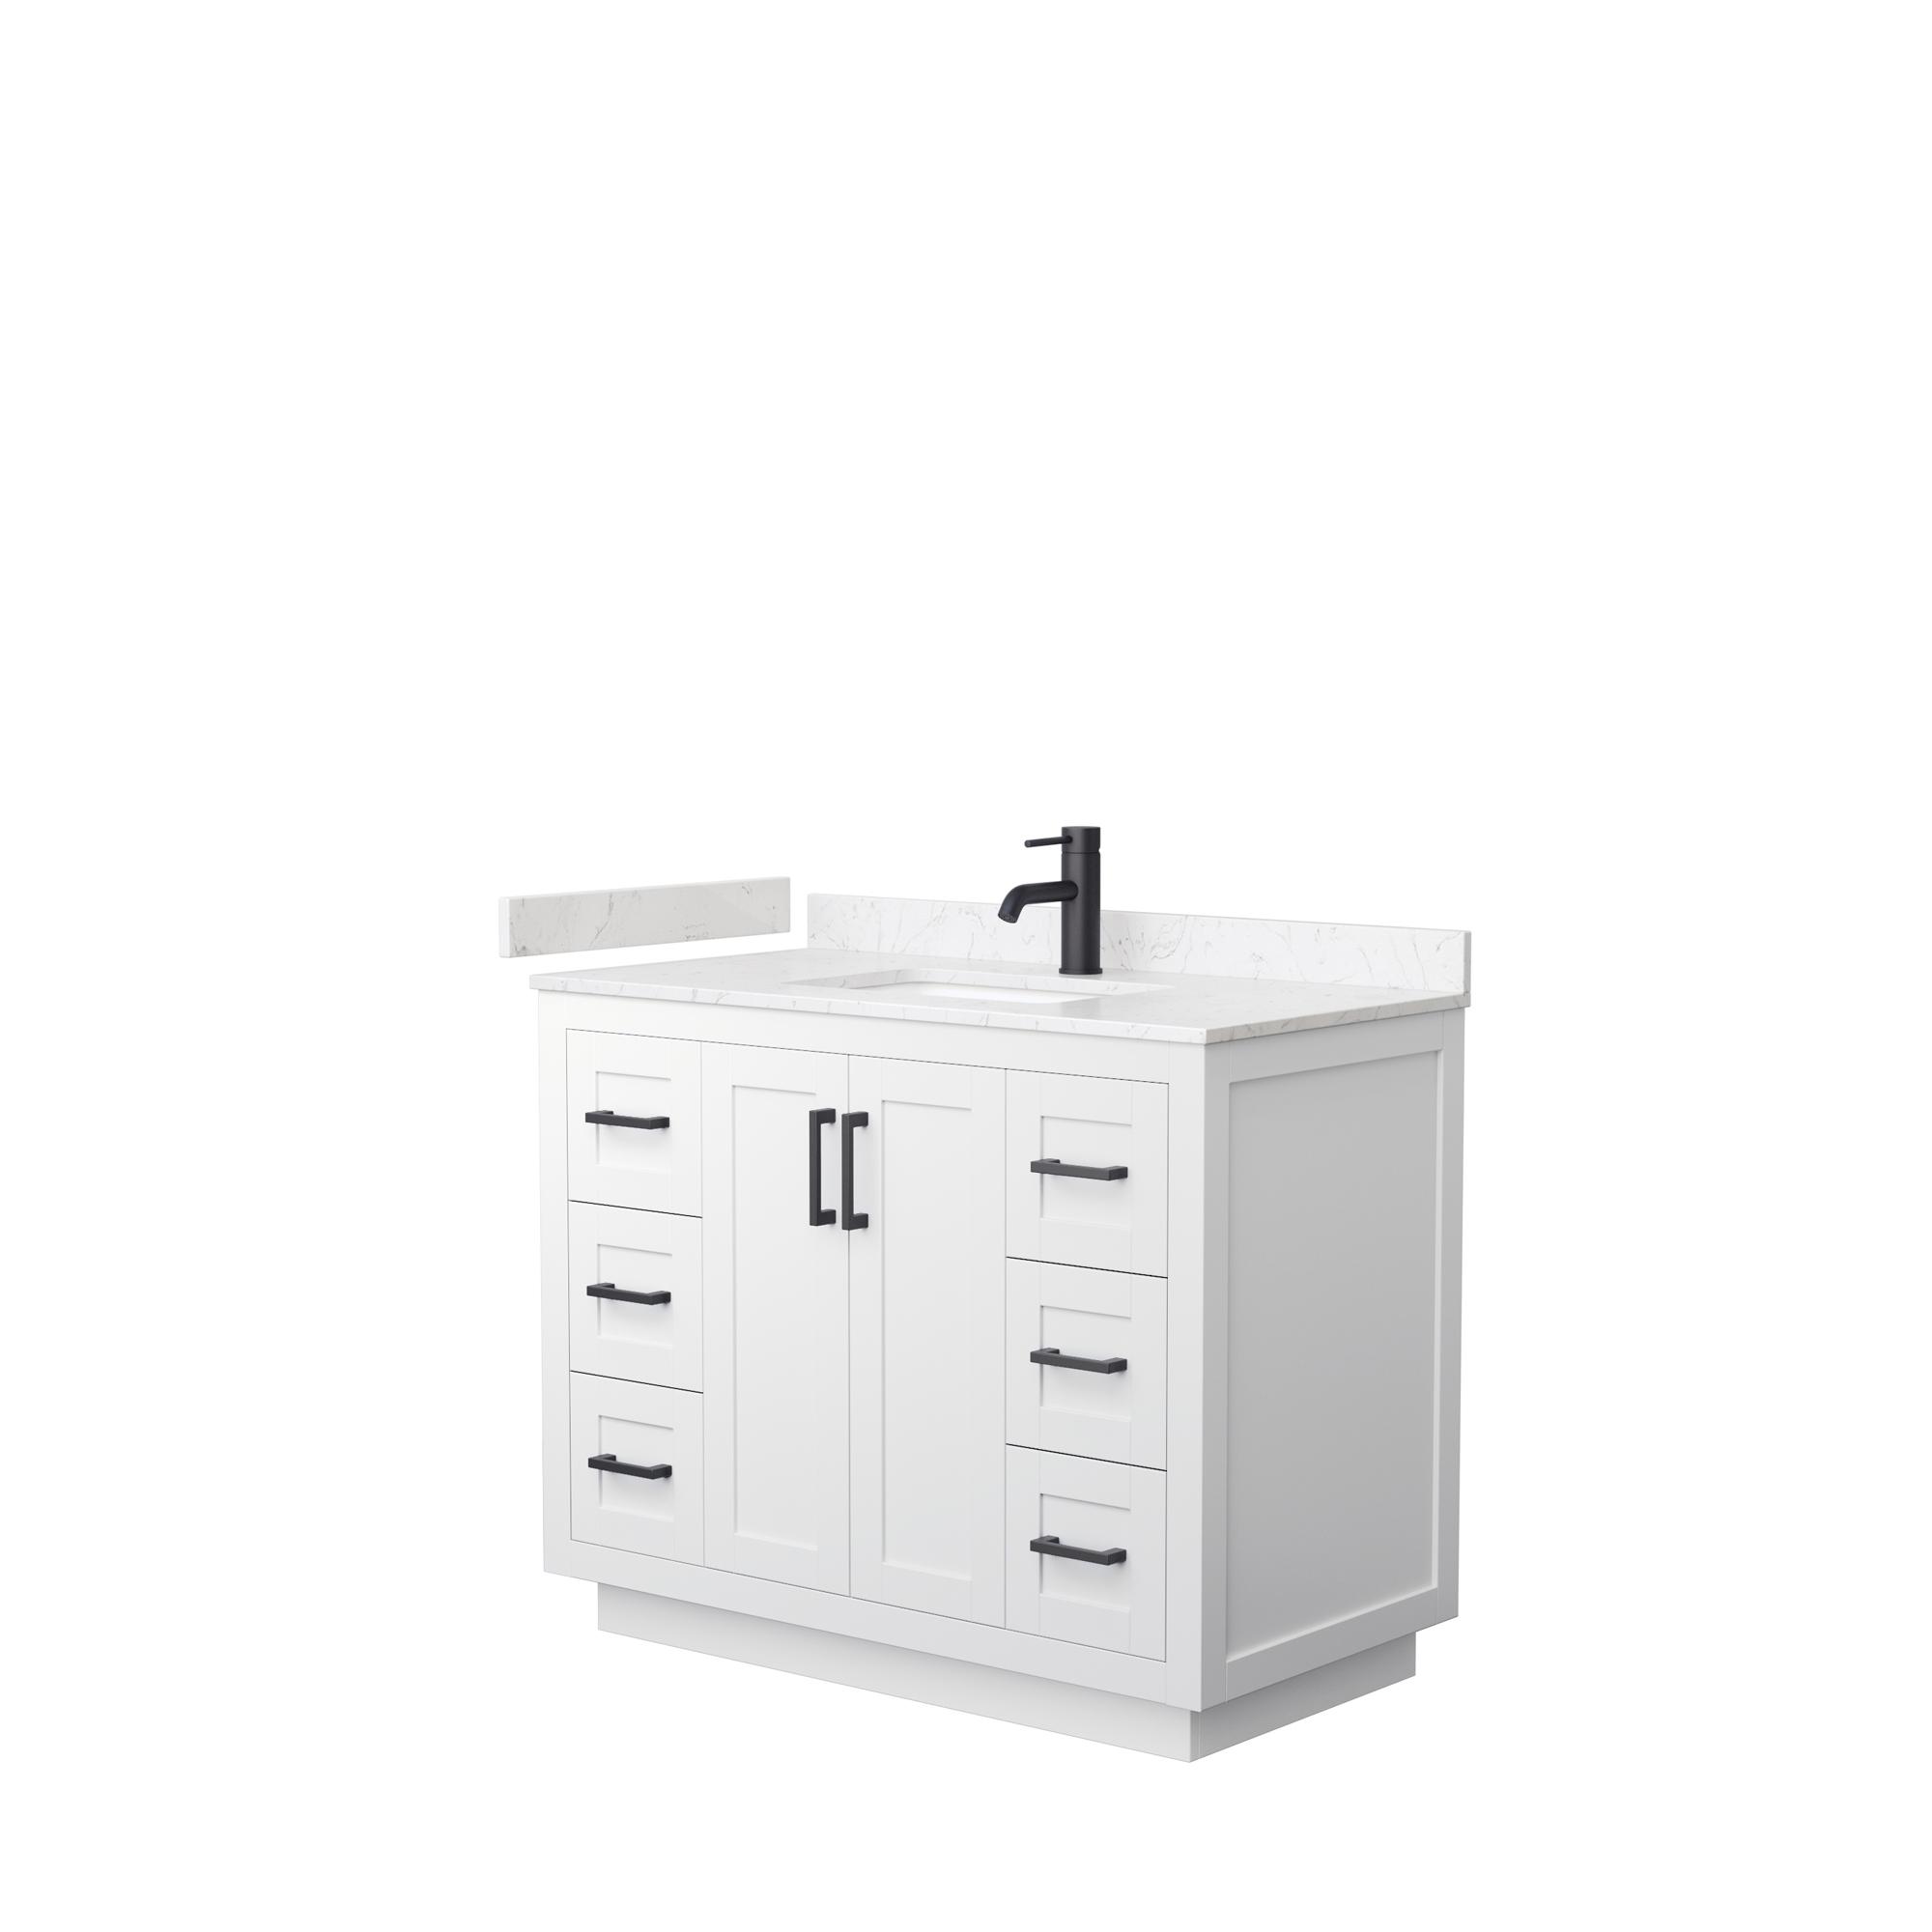 "42"" Single Bathroom Vanity in White, Light-Vein Carrara Cultured Marble Countertop, Undermount Square Sink, Matte Black Trim"